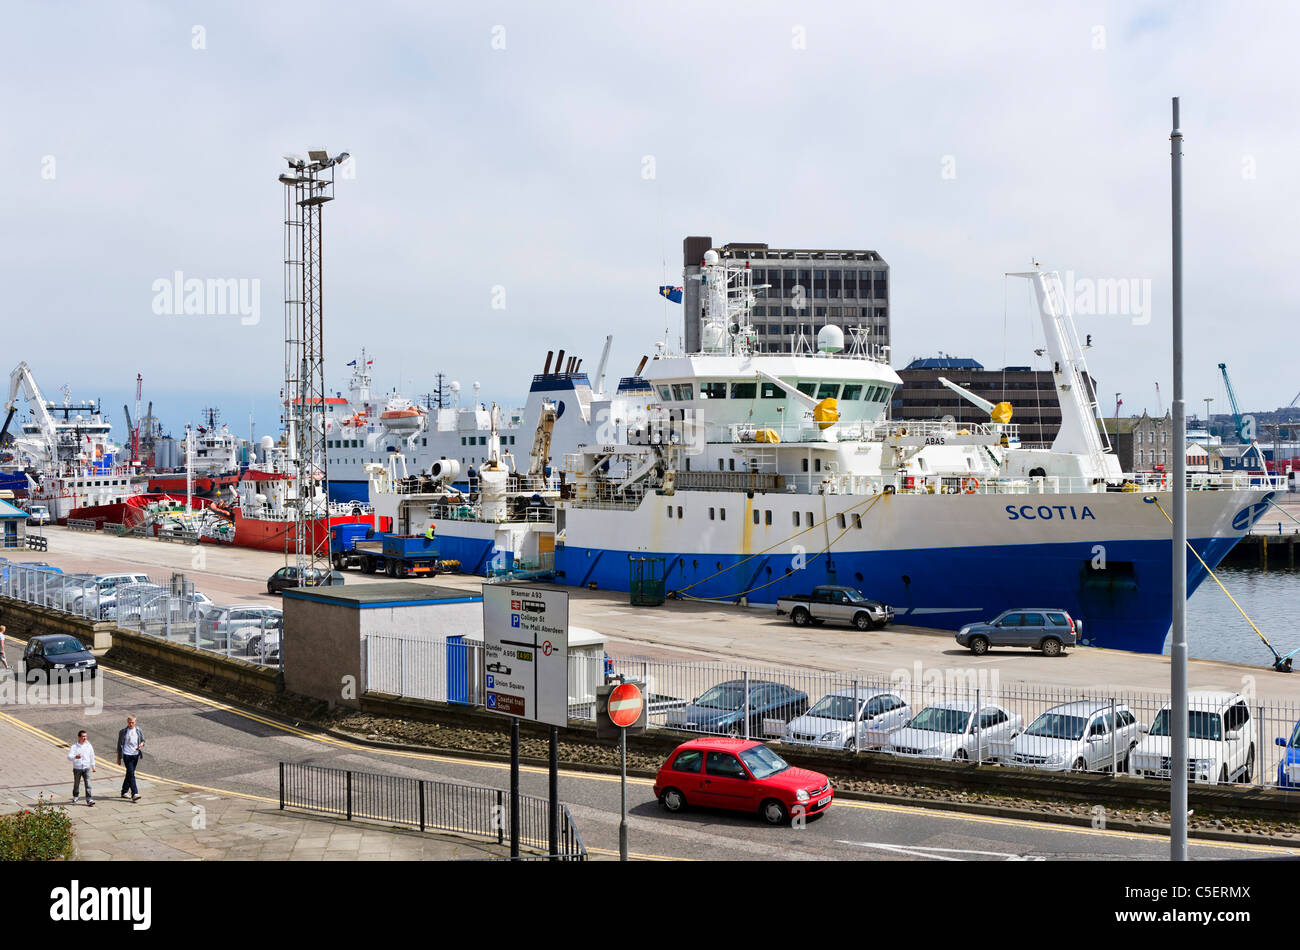 The Docks in Aberdeen, Scotland, UK - Stock Image